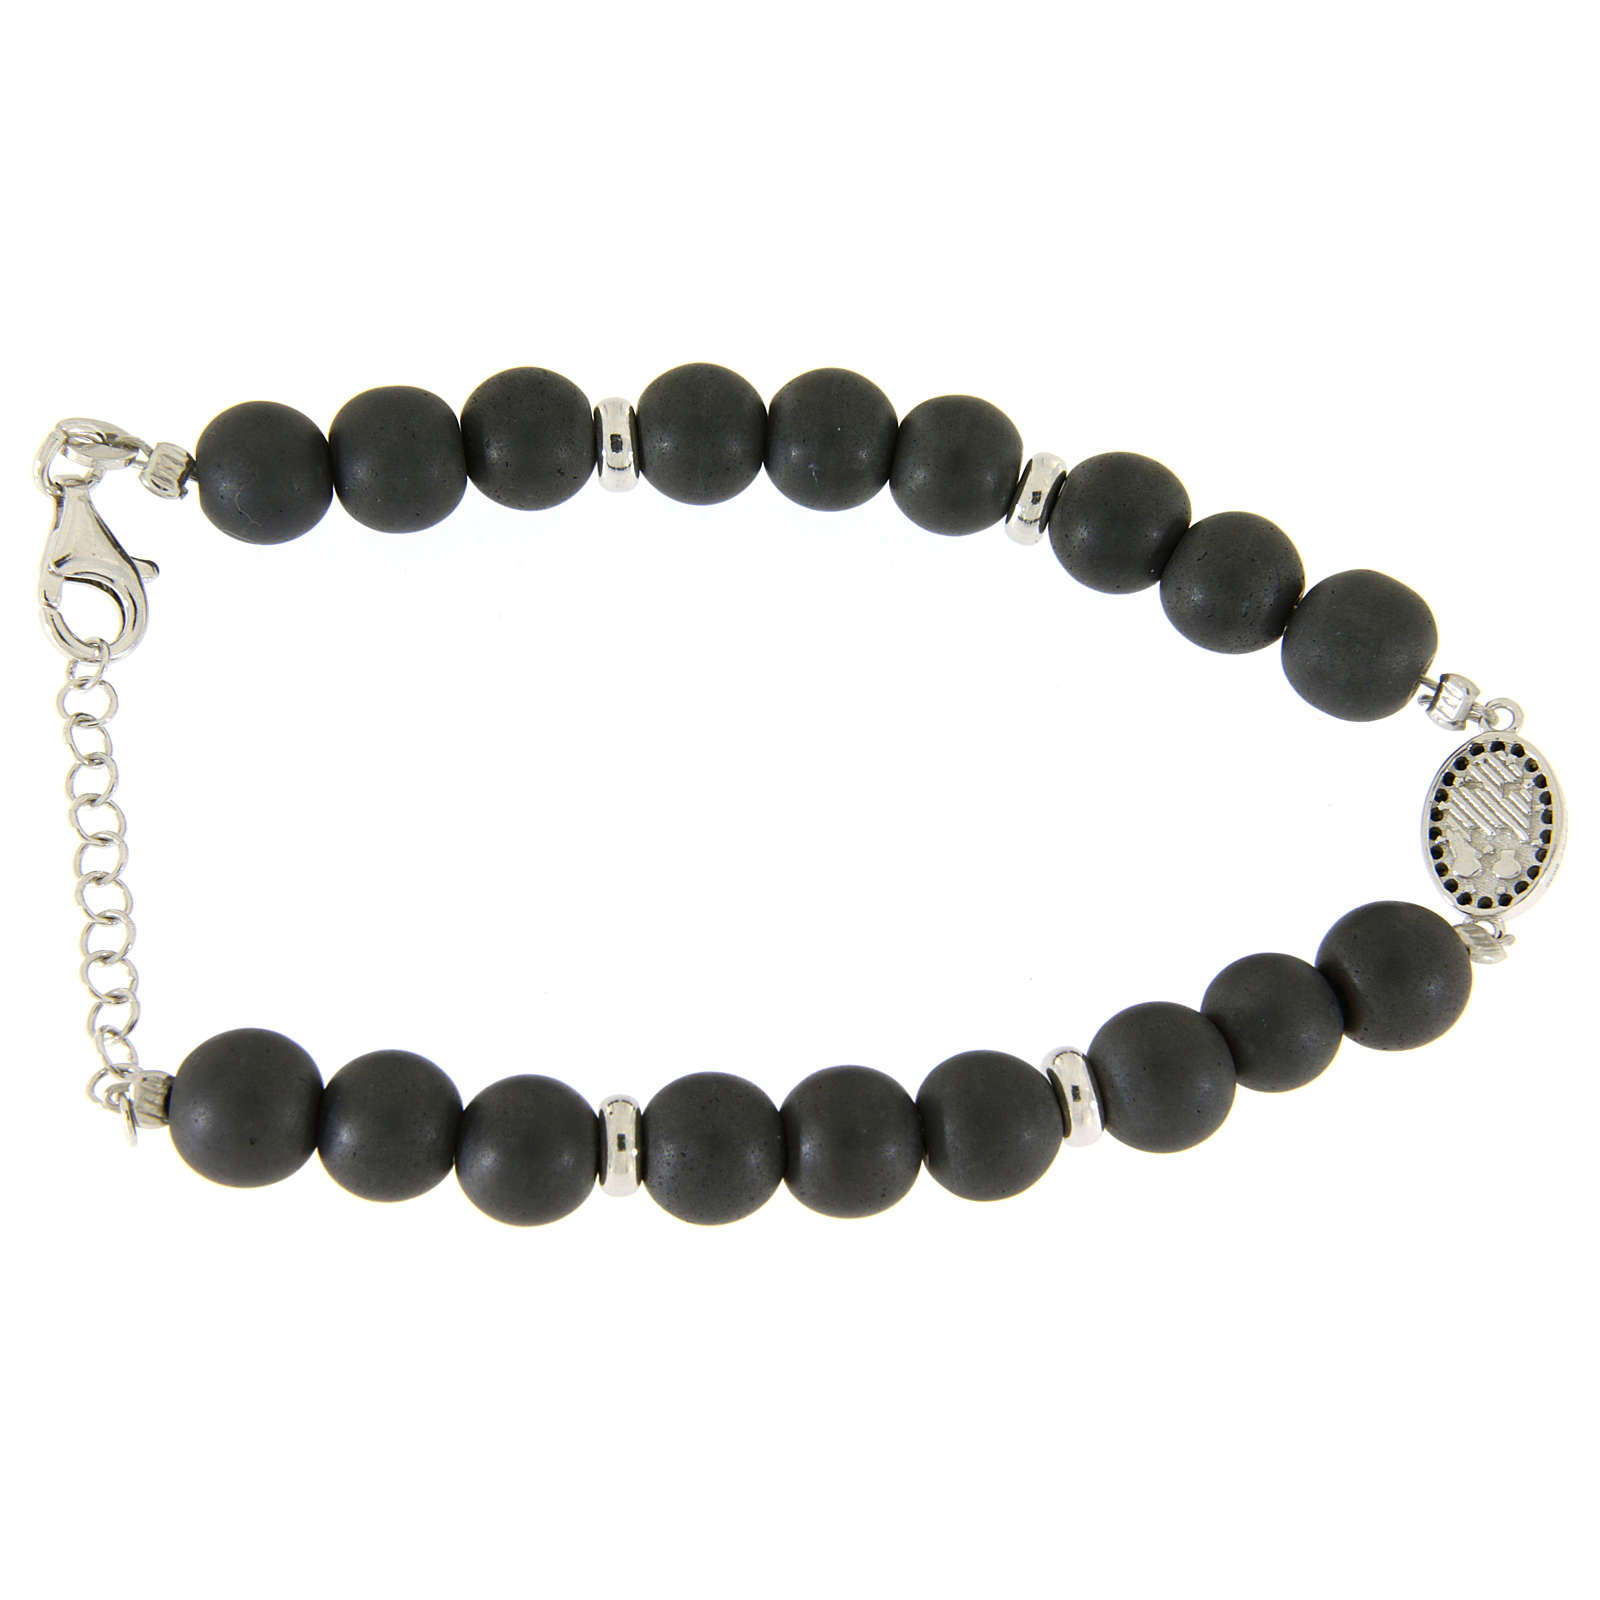 Bracelet with Saint Rita medalet, black zircons and hematite beads sized 7 mm 4